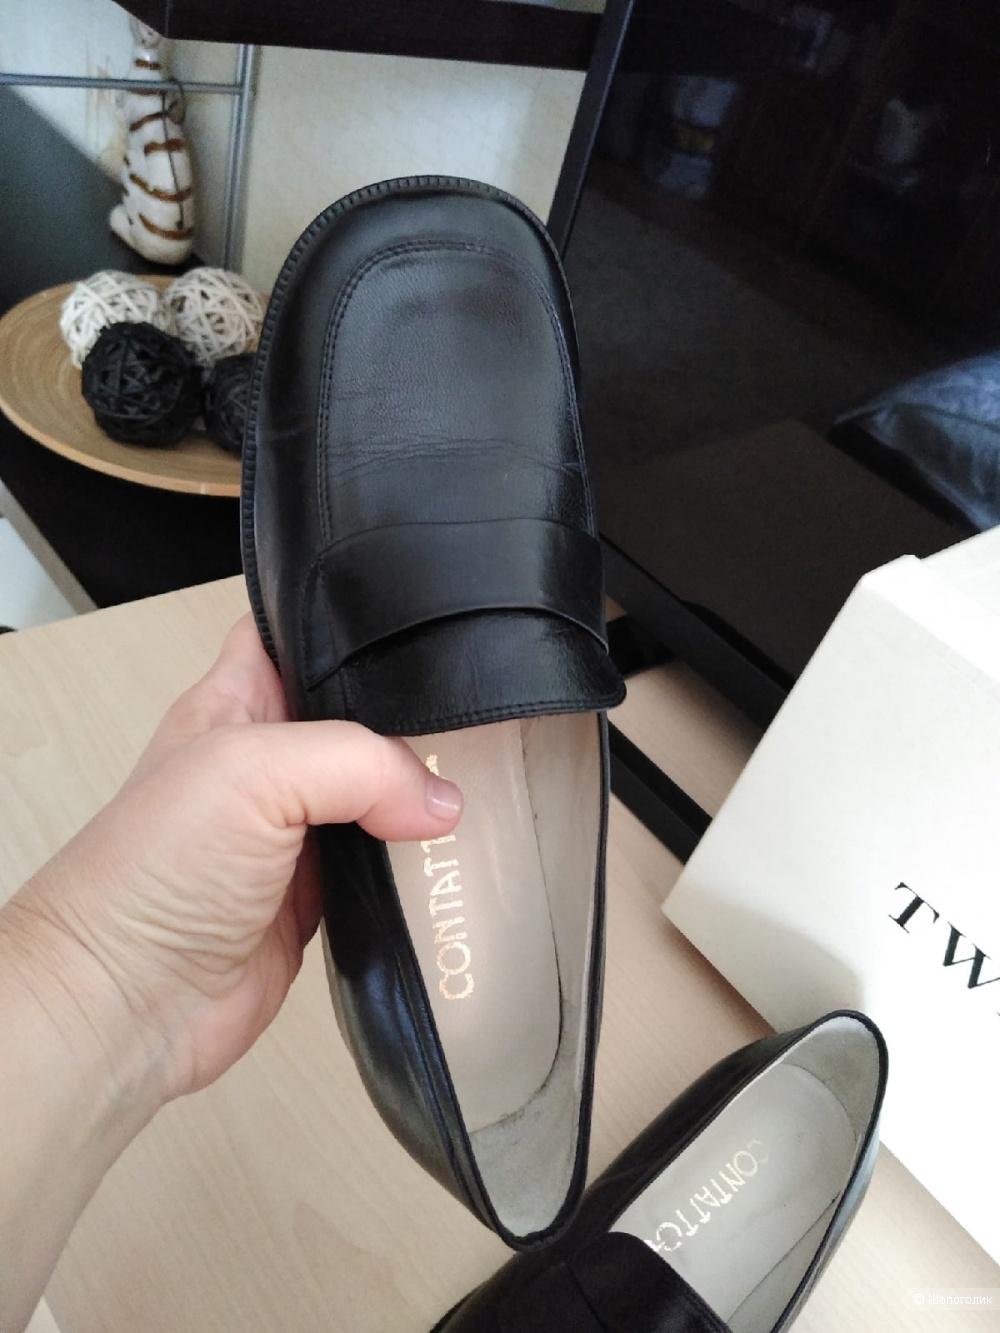 Лоферы (туфли) Contatto. Размер: 36 1/2 (23,5 см).